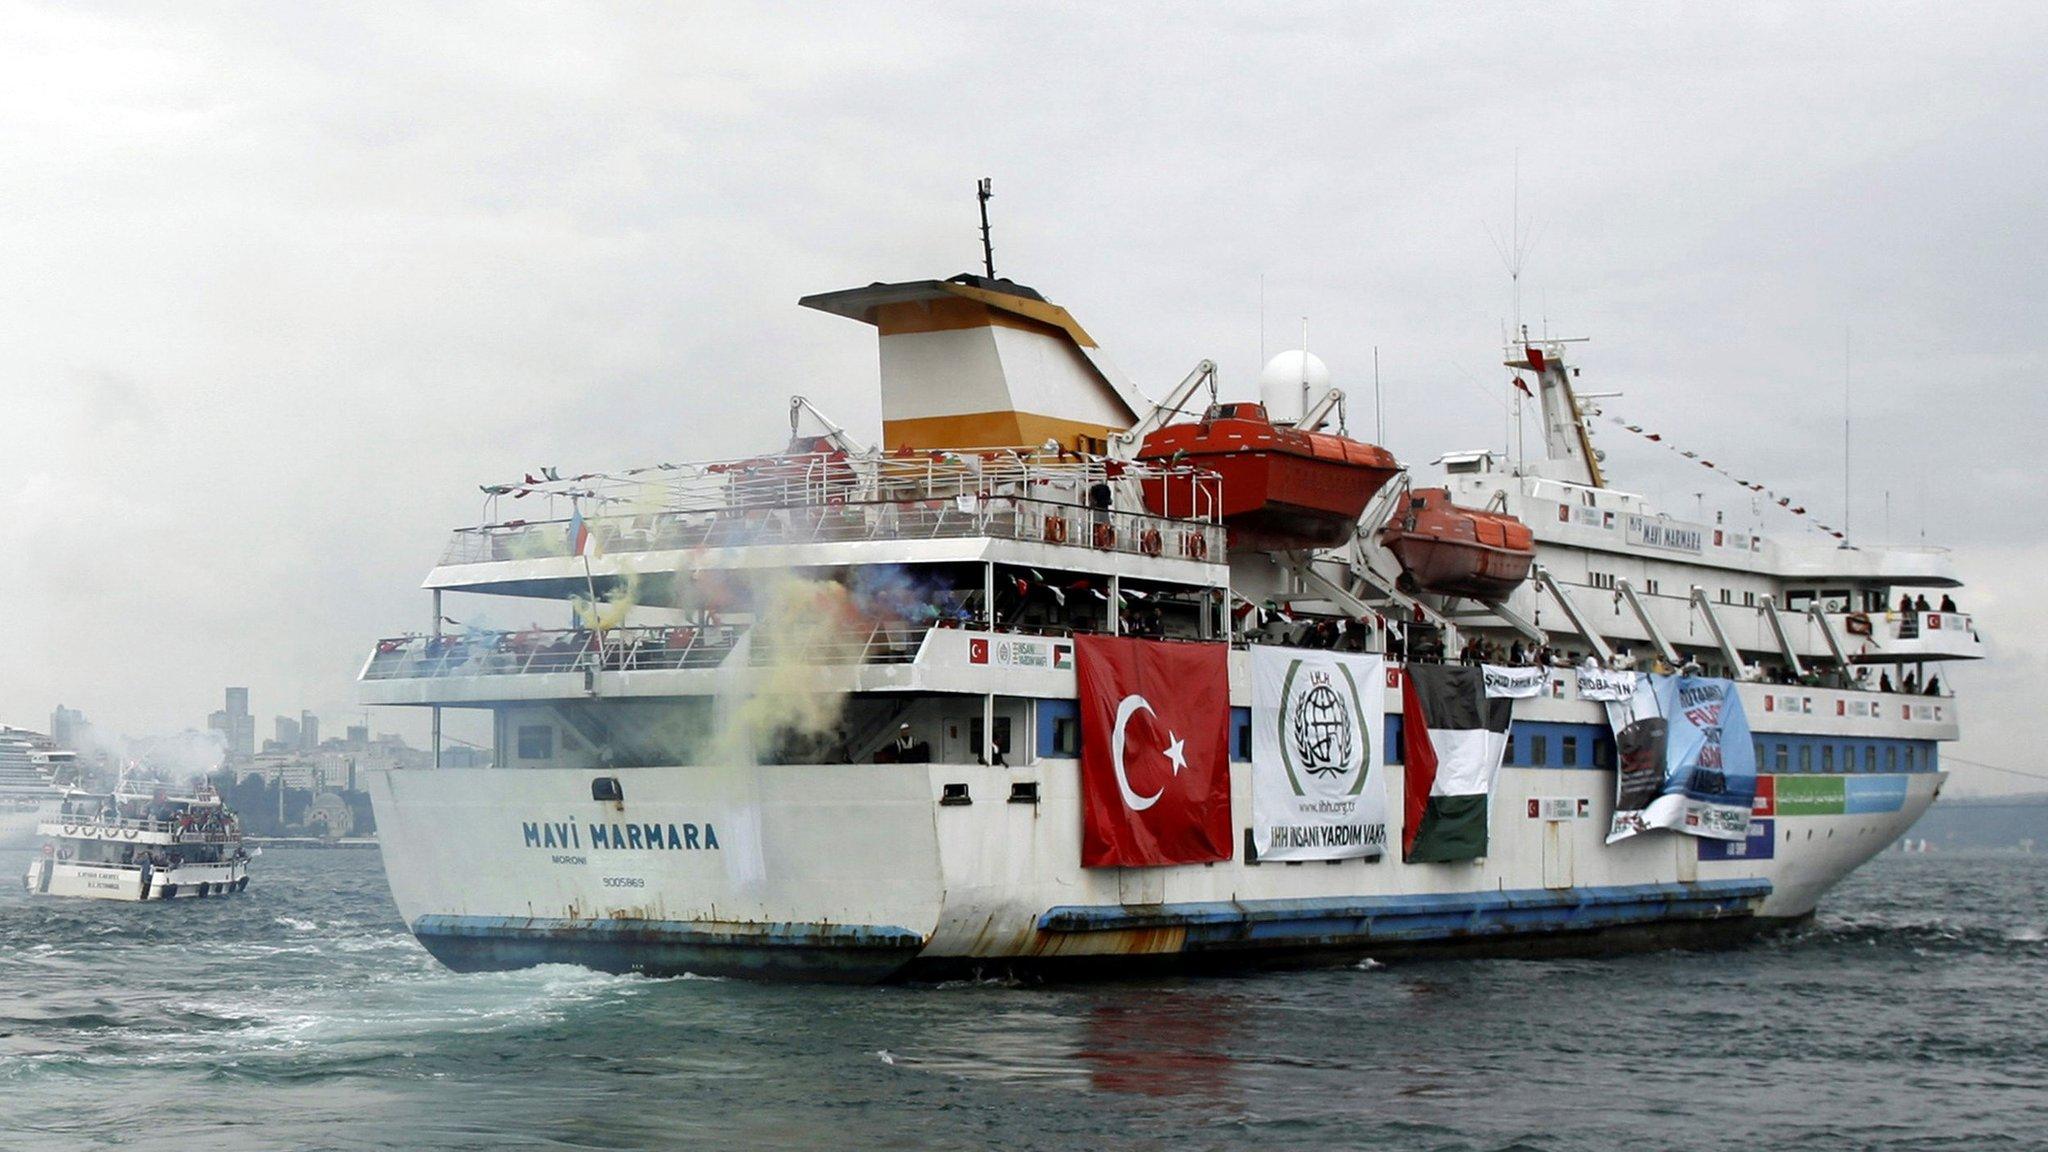 Israel and Turkey to end rift over Gaza flotilla killings